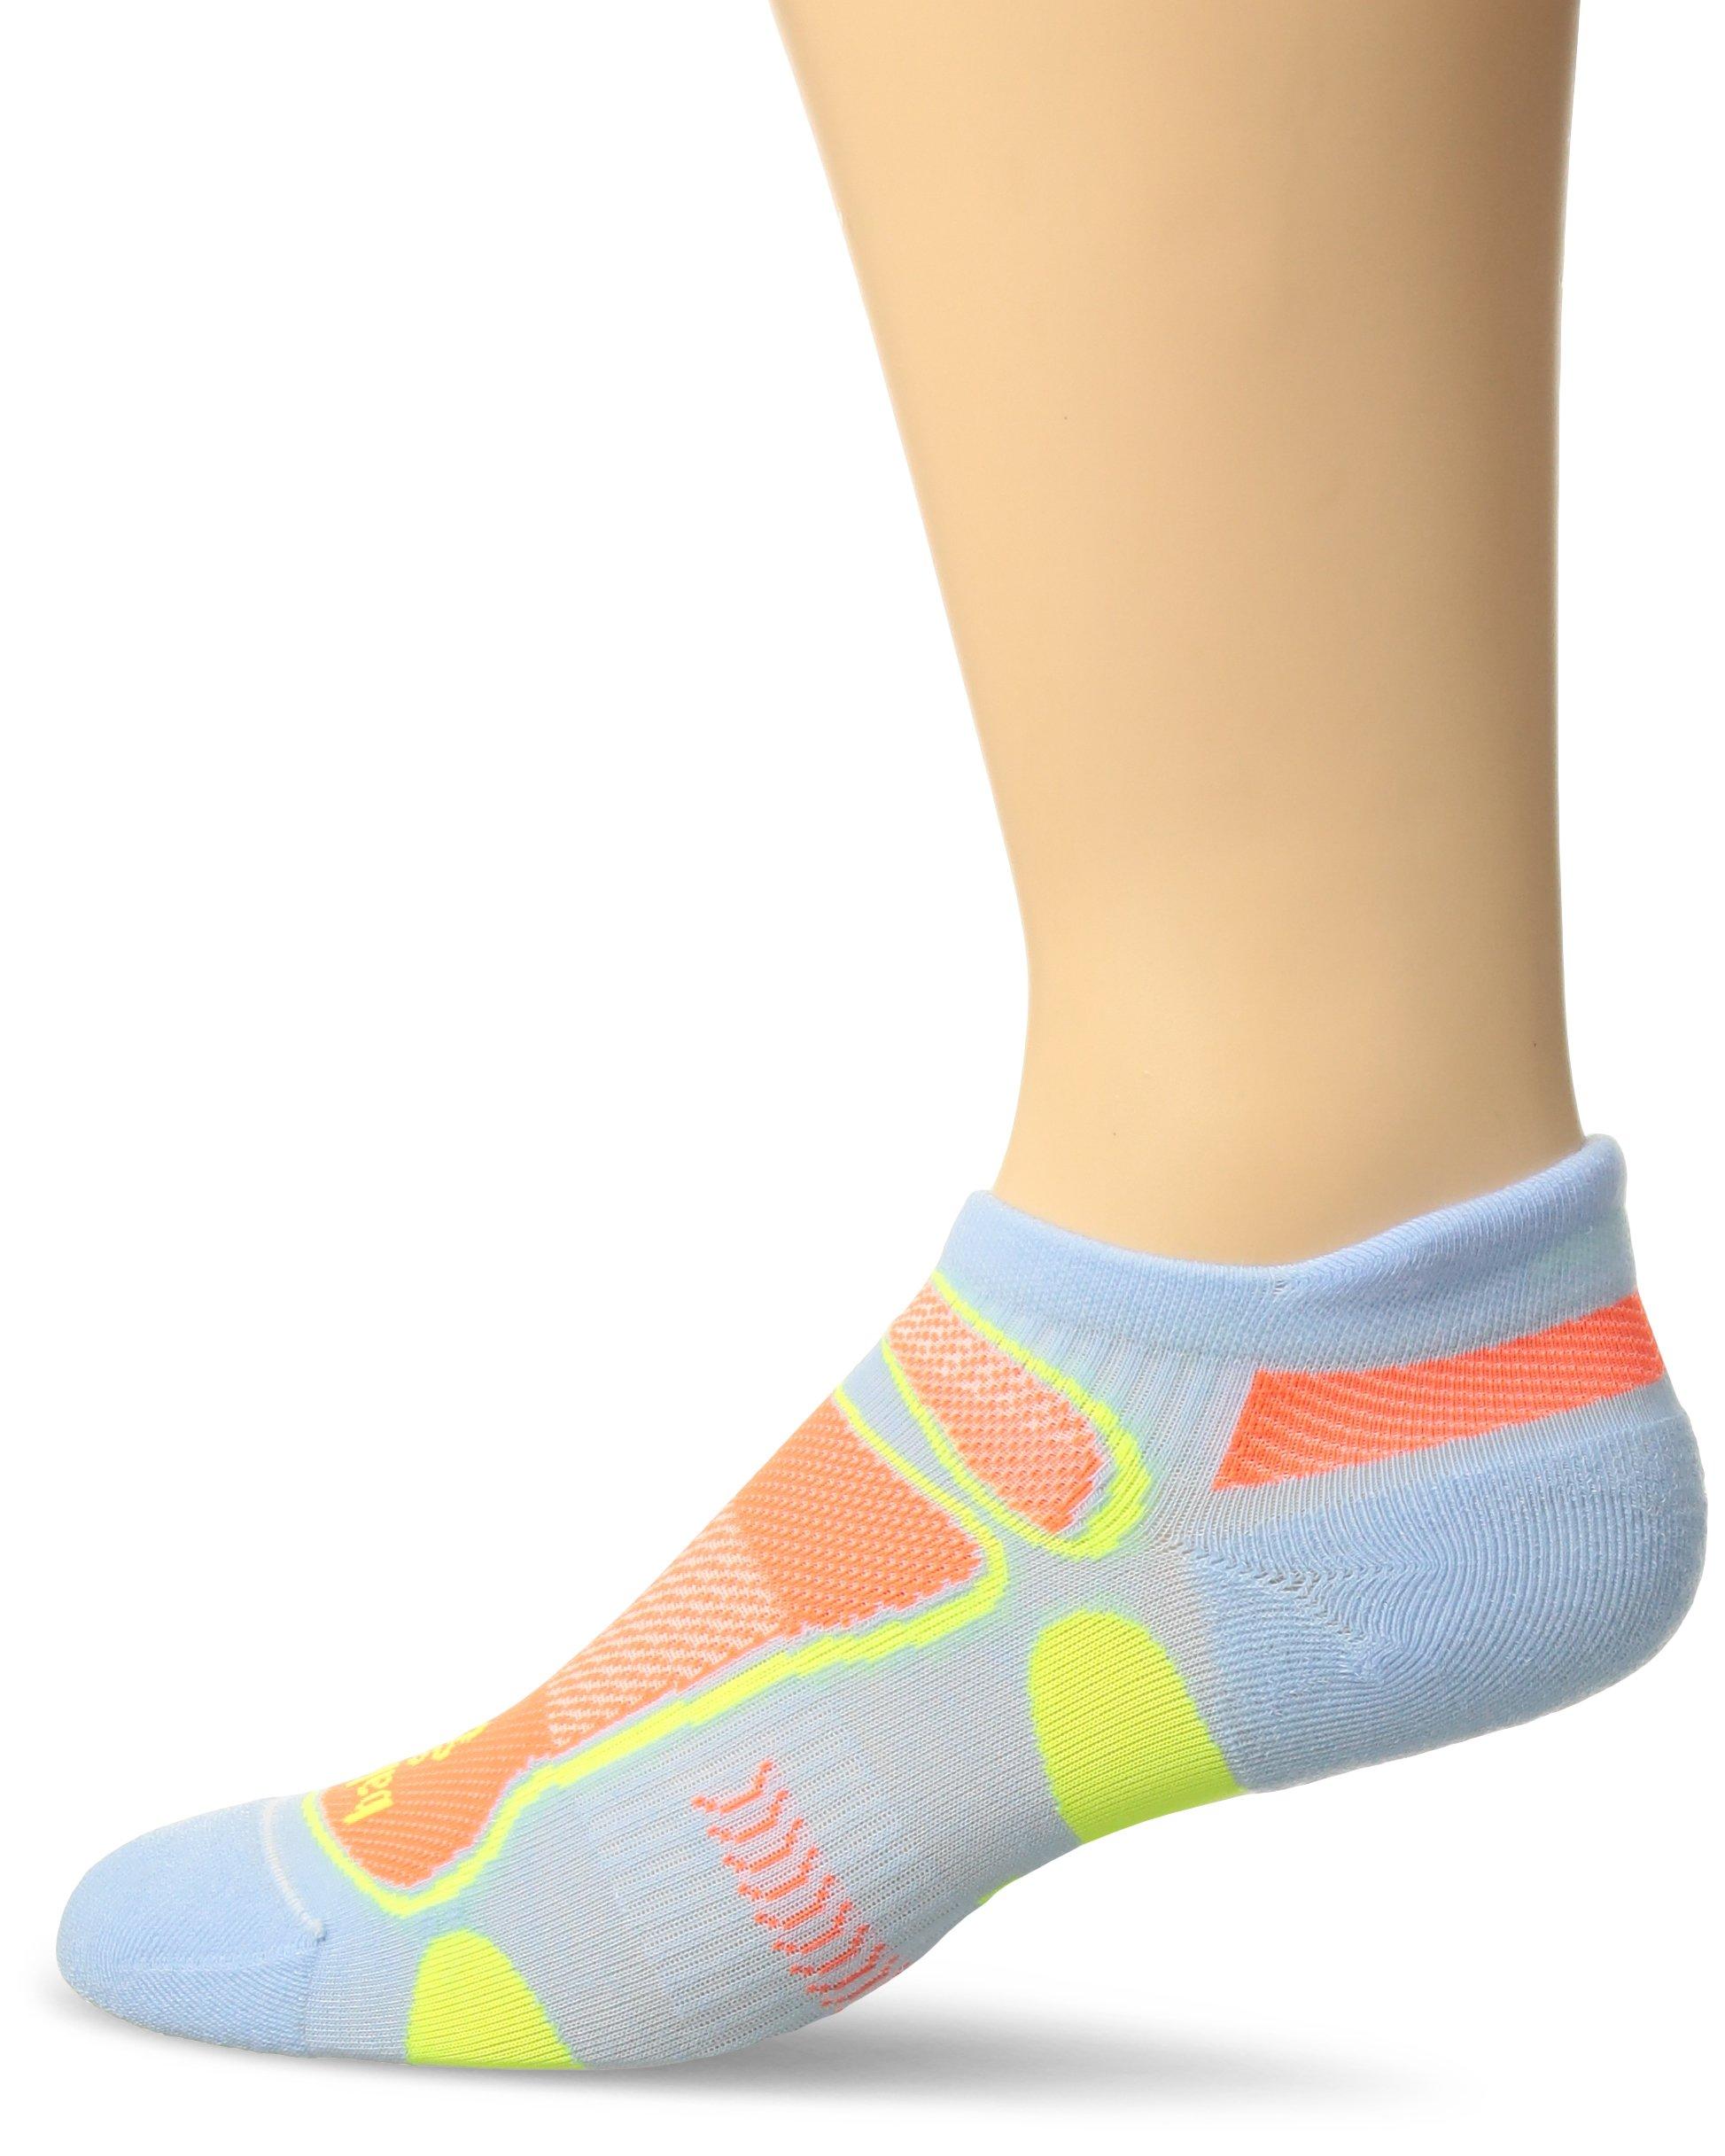 Balega Ultralight No Show Athletic Running Socks for Men and Women (1-Pair), Cool Blue, Small